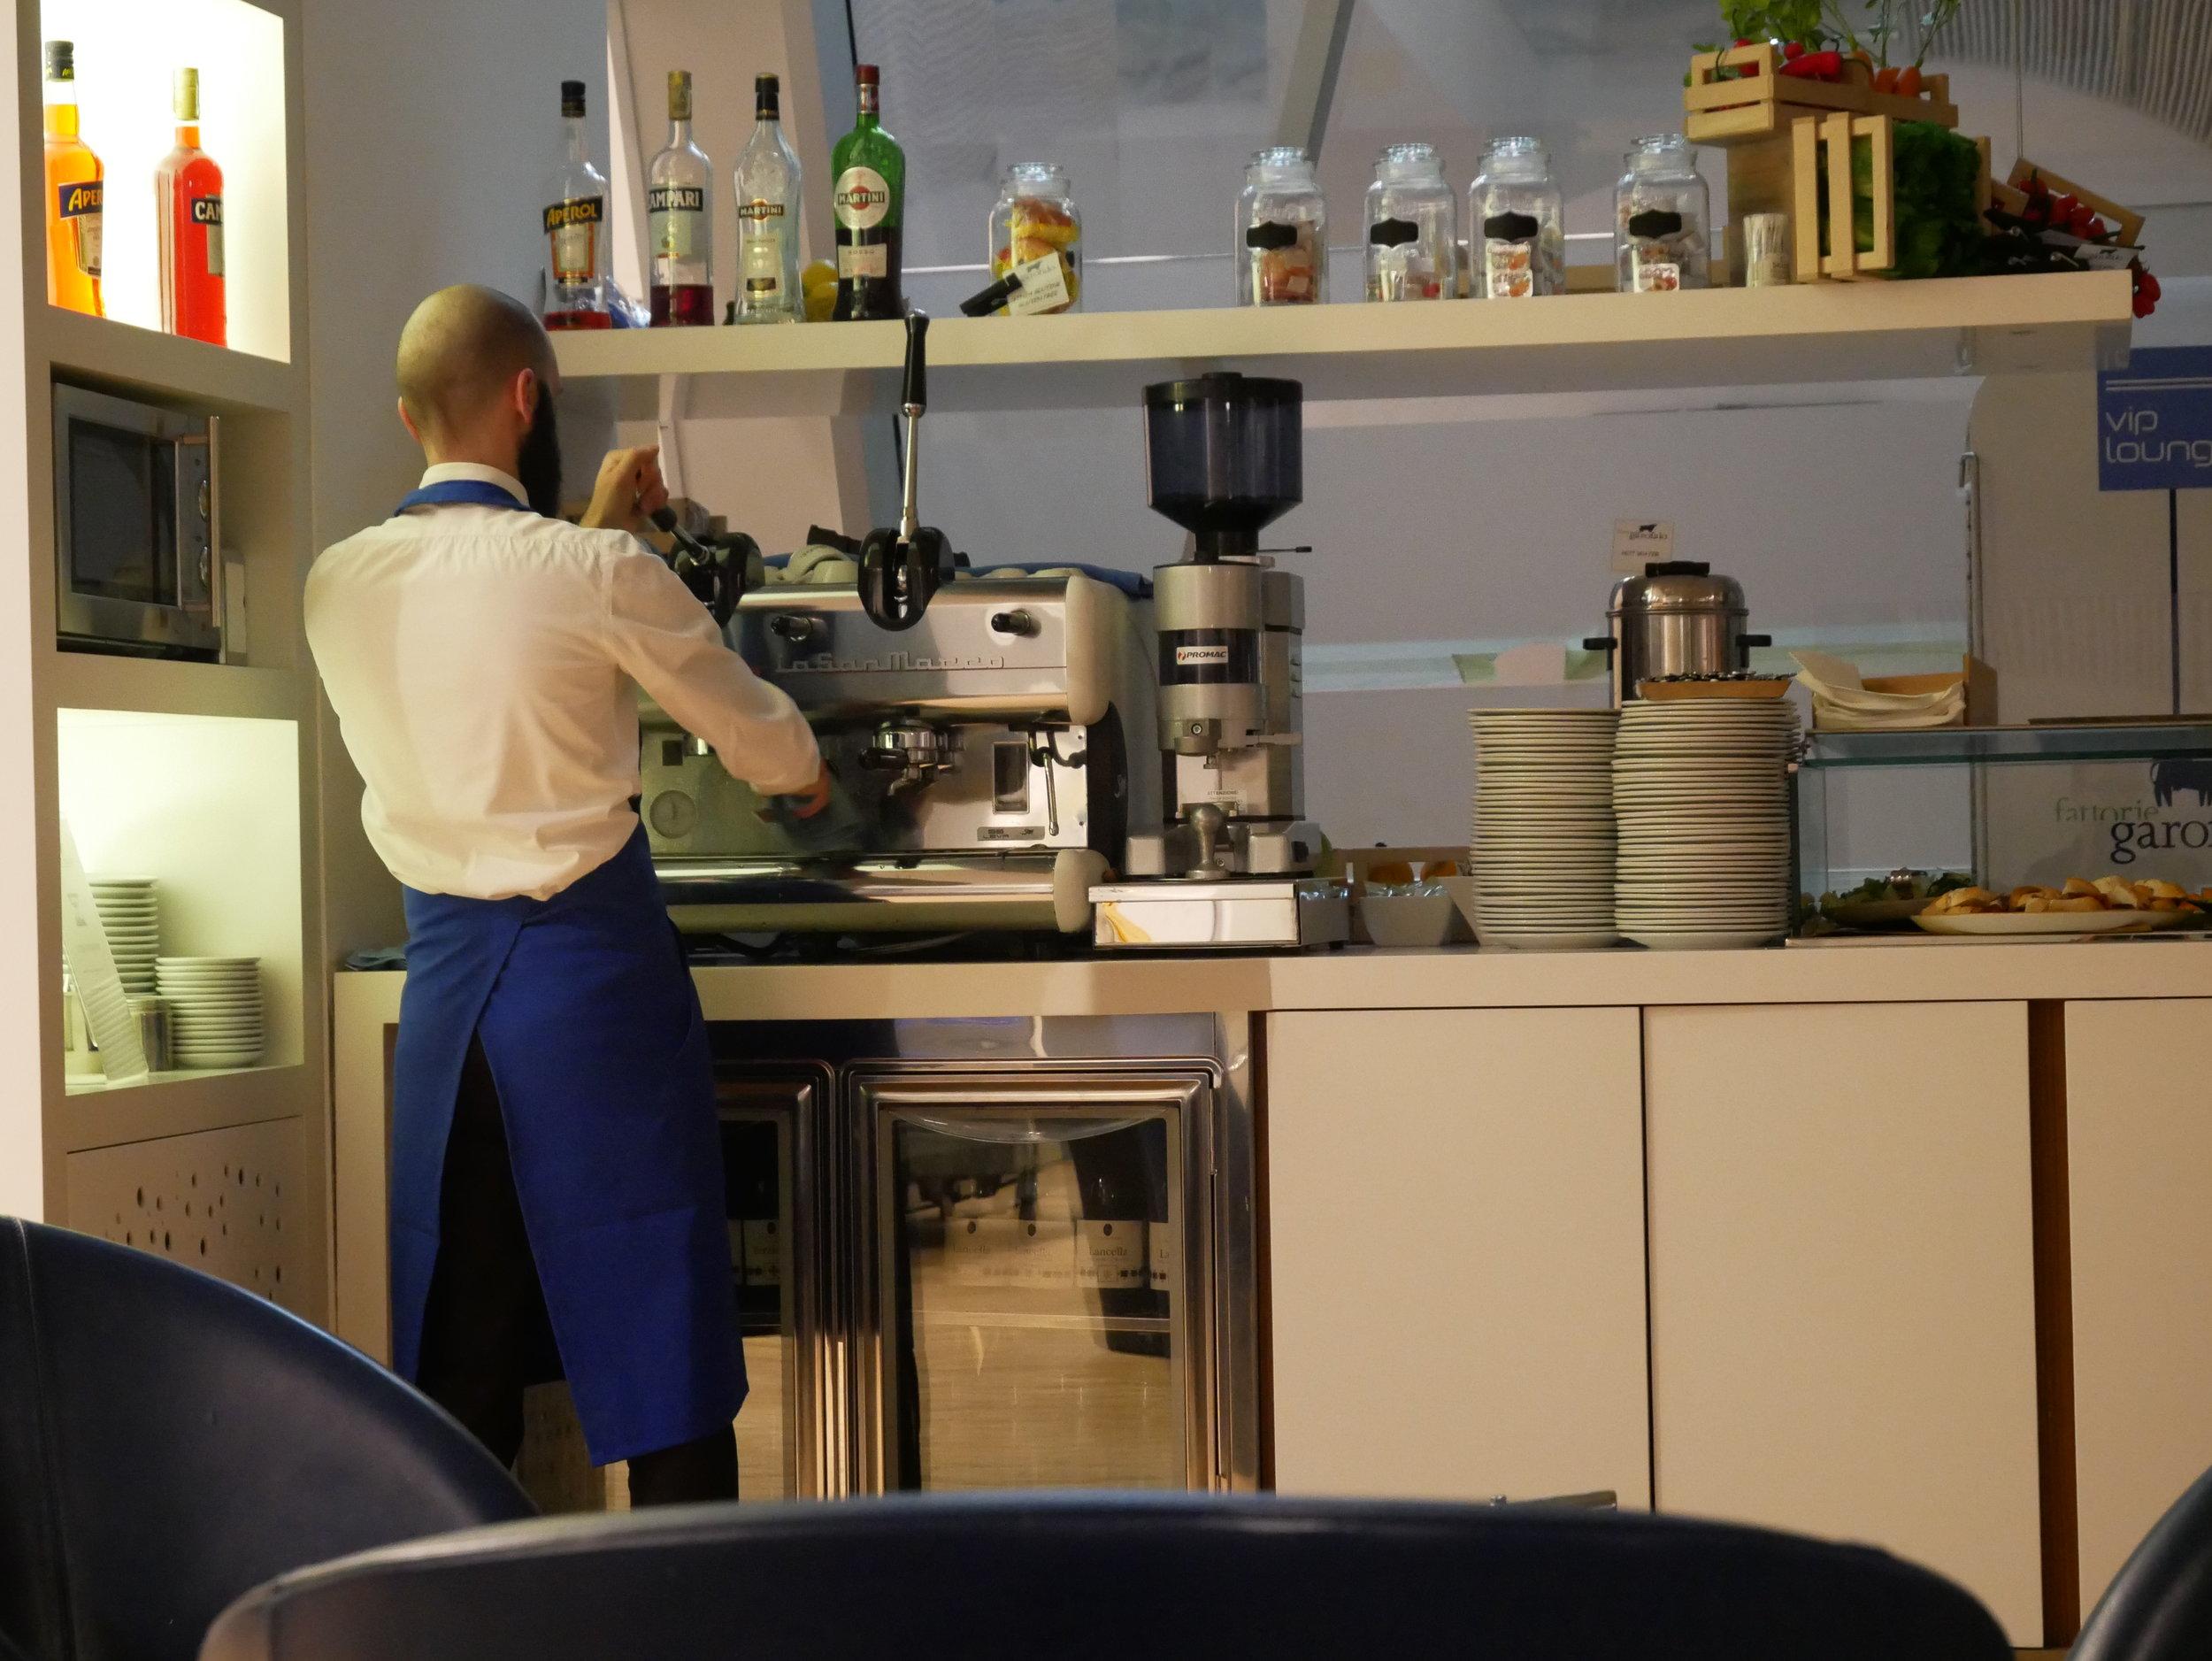 Bergamo Airside VIP lounge barista.jpg